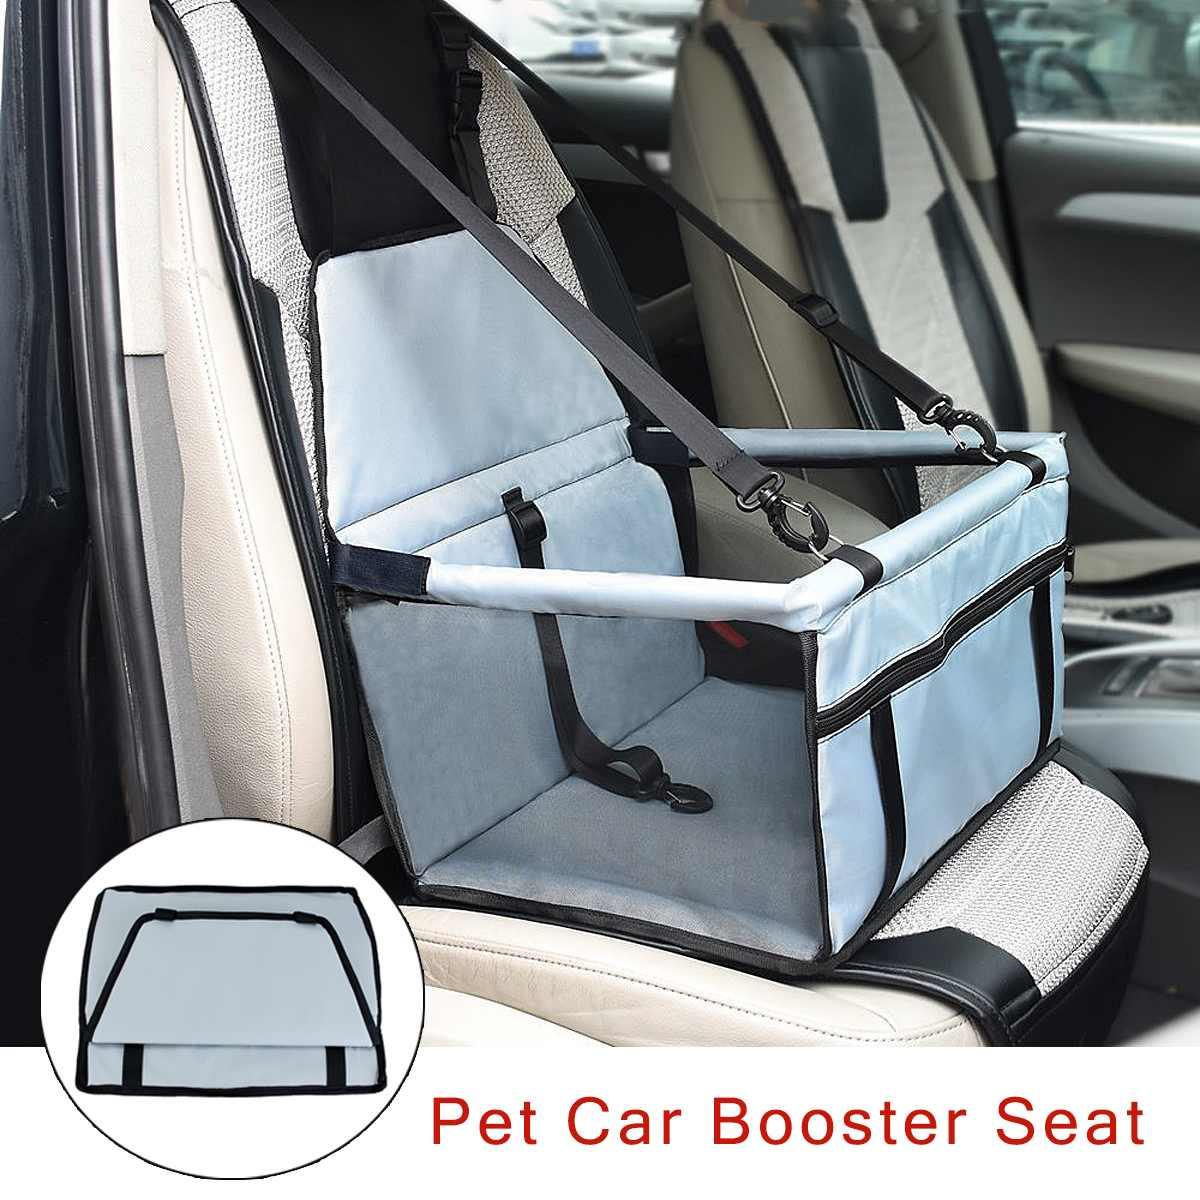 600D Waterproof Portable Booster Car Seat Cover Basket Mat Auto Protector Puppy Travel Box Bag Dog Cat Pet Safe Folding